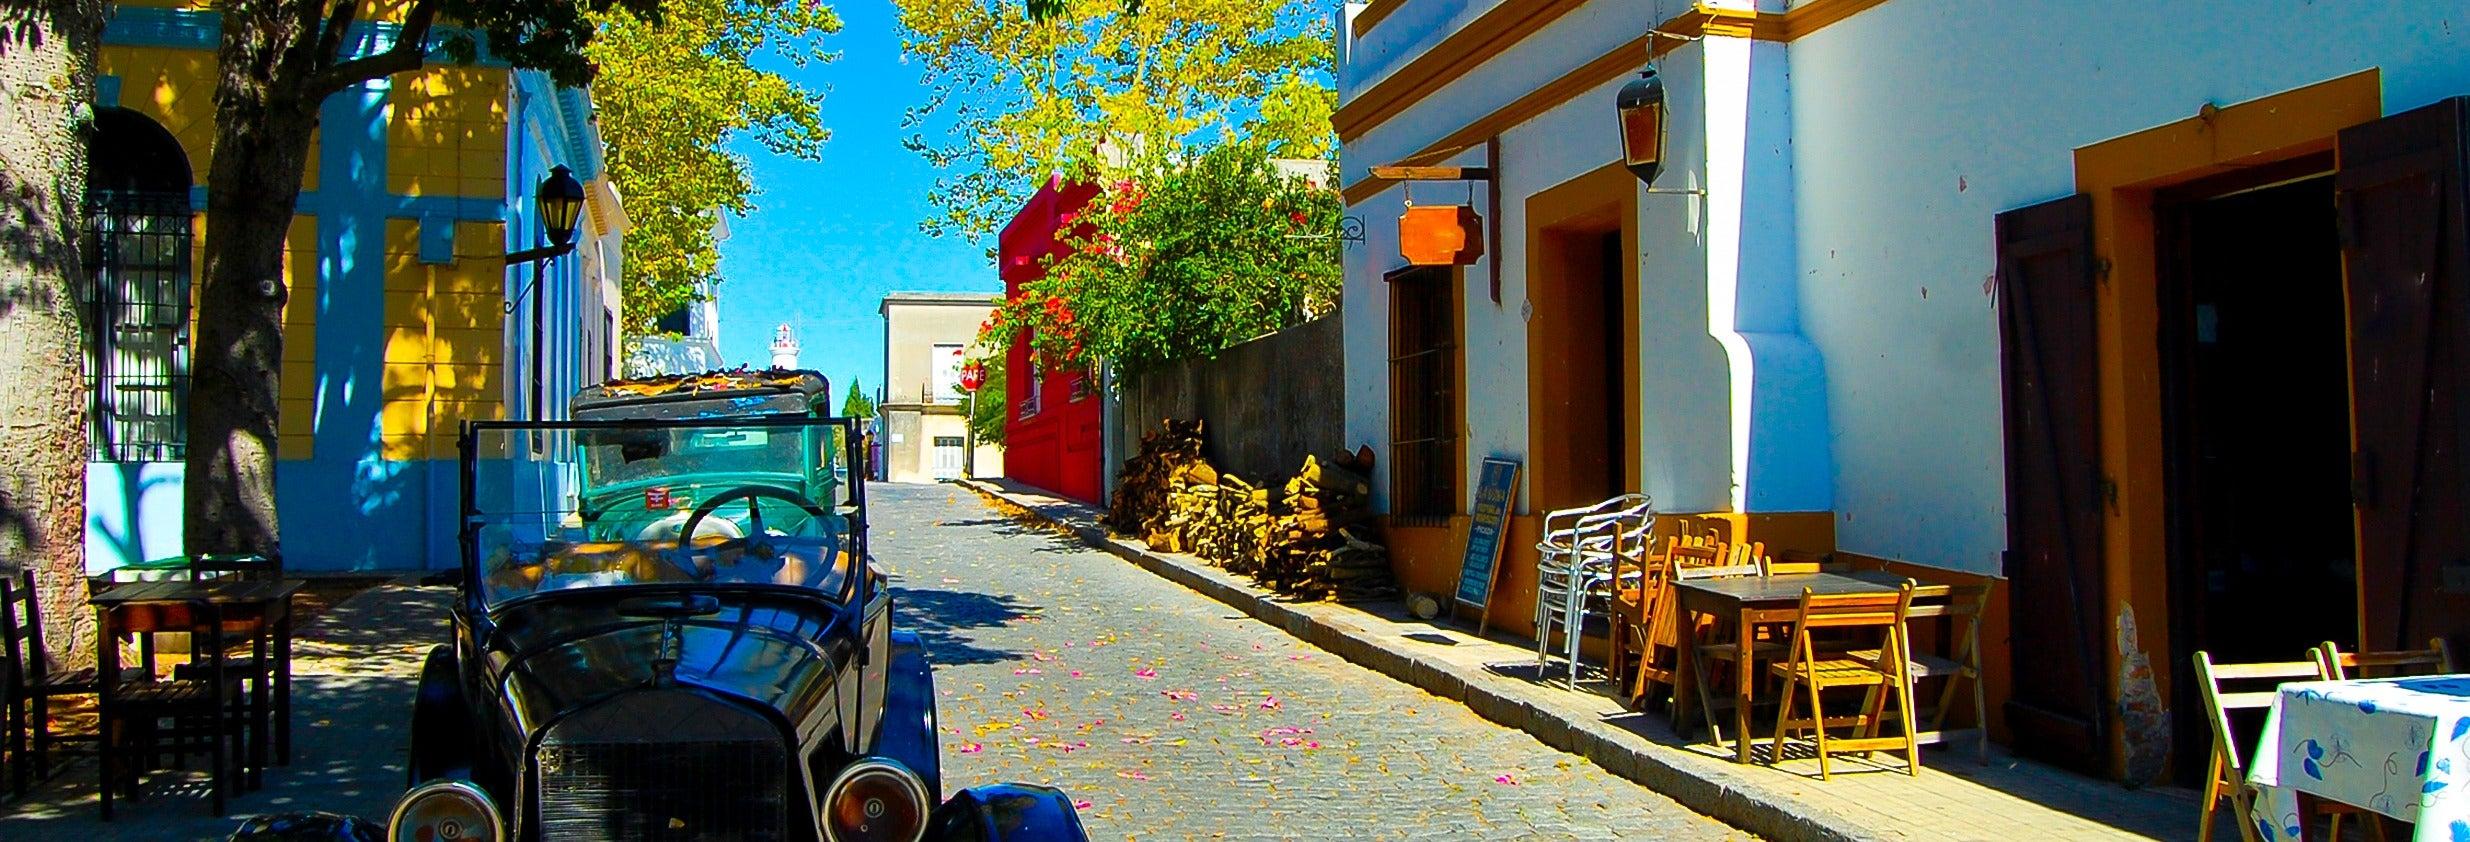 Colonia Del Sacramento Trip From Buenos Aires Civitatis Com